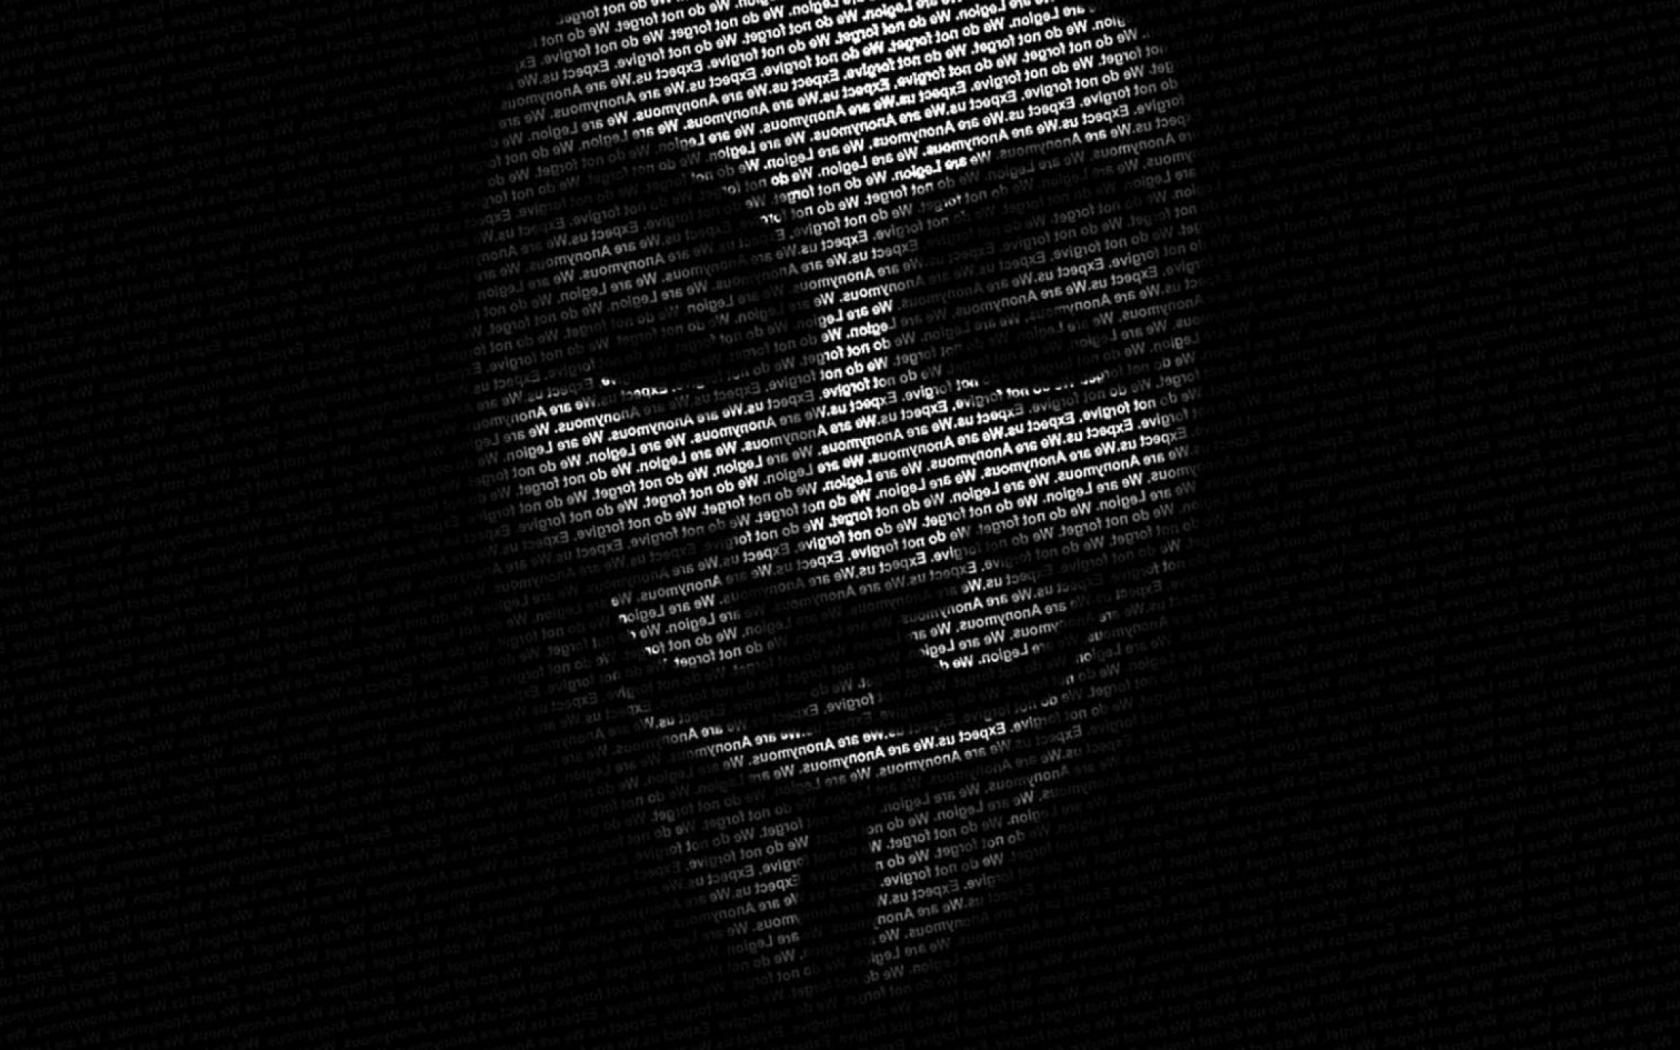 Free Download Anonymous Wallpaper 1920x1080 Fond Ecran Hd 2560x1440 For Your Desktop Mobile Tablet Explore 46 Anonymous Hd Wallpaper 1920x1080 Windows 10 Hd Wallpaper 1920x1080 Hd Wallpapers Windows 7 Wallpaper Hd 1920x1080